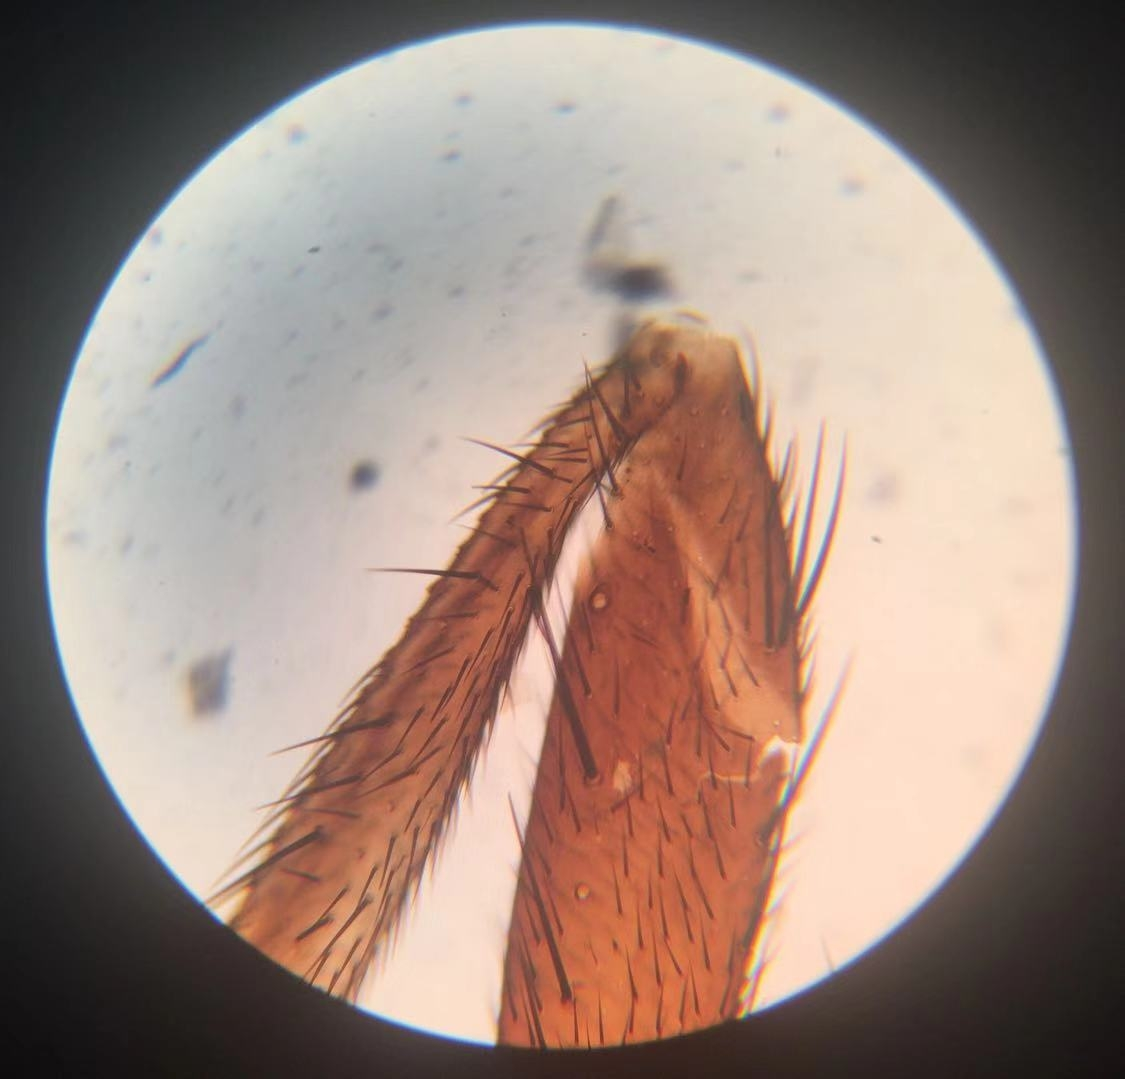 Housefly Legs 100x